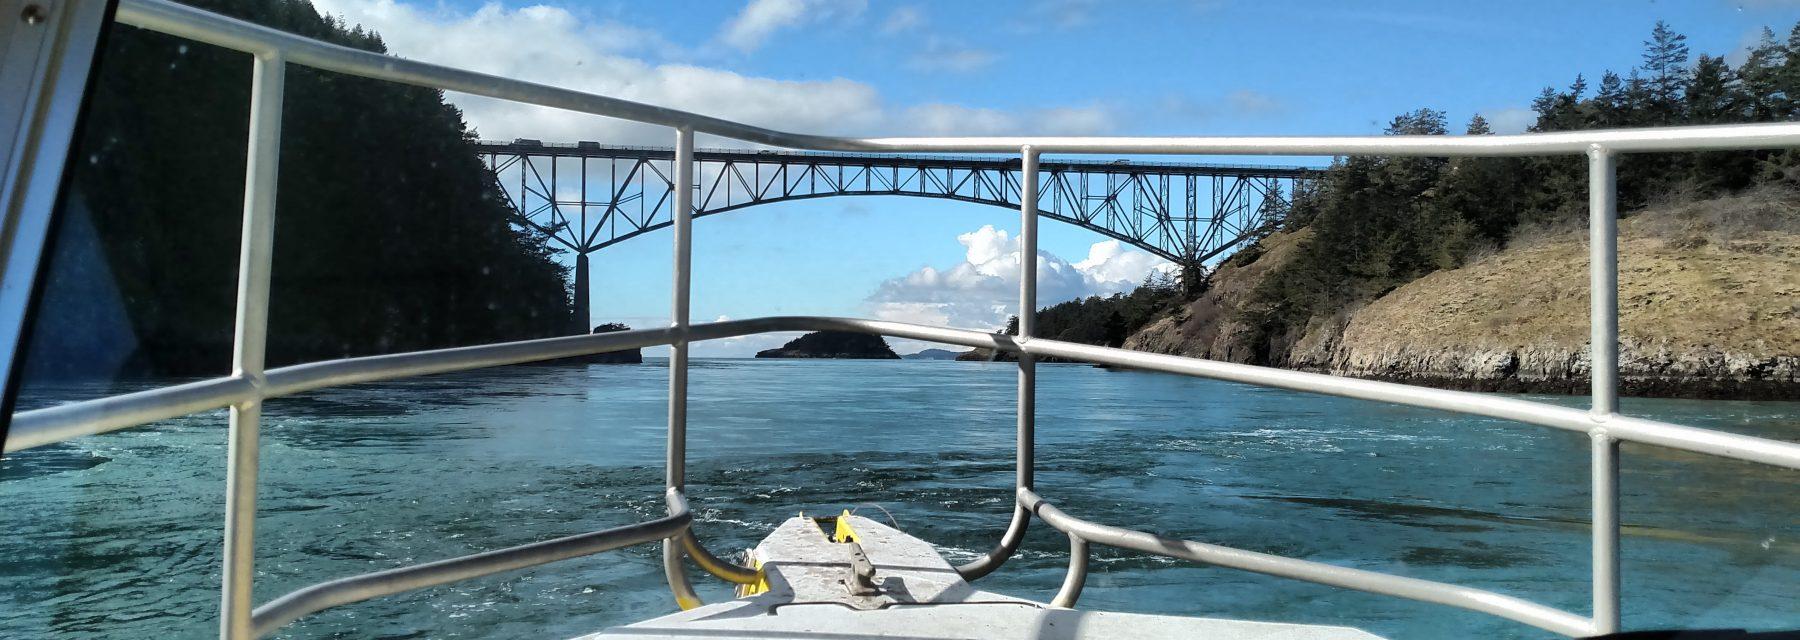 Scientific Boating Safety Association